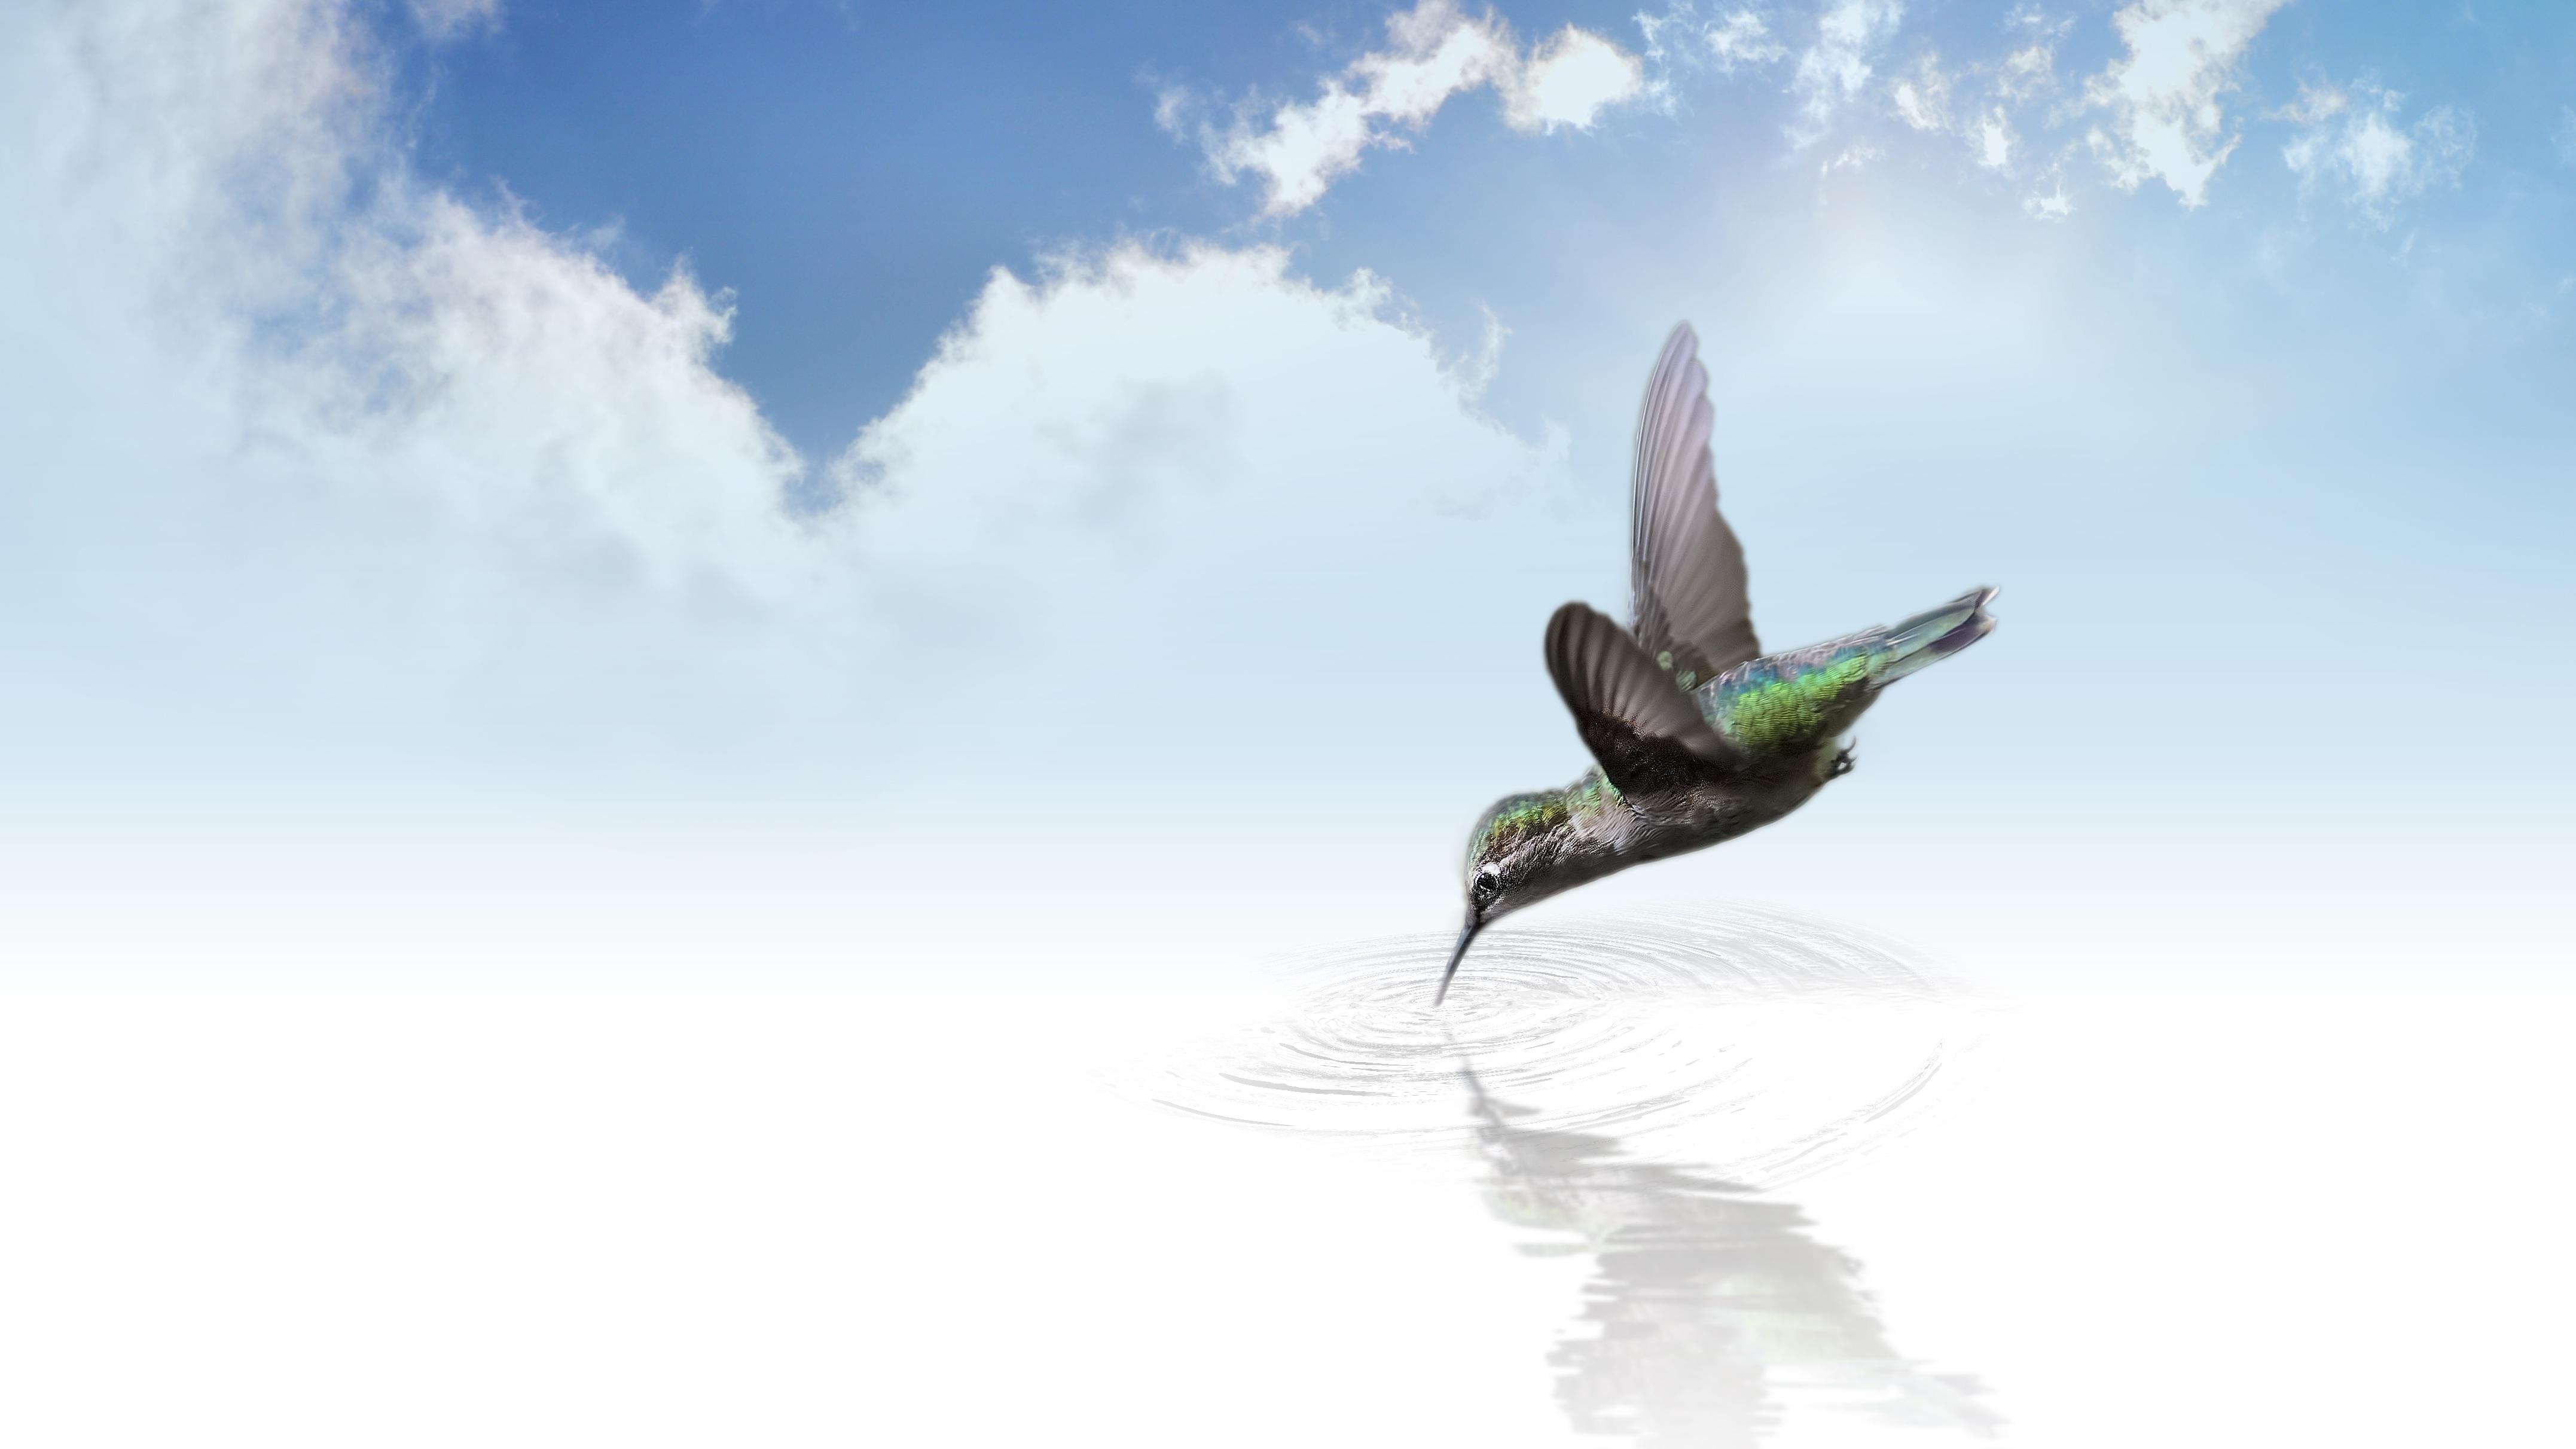 free stock photos of hummingbird pexels